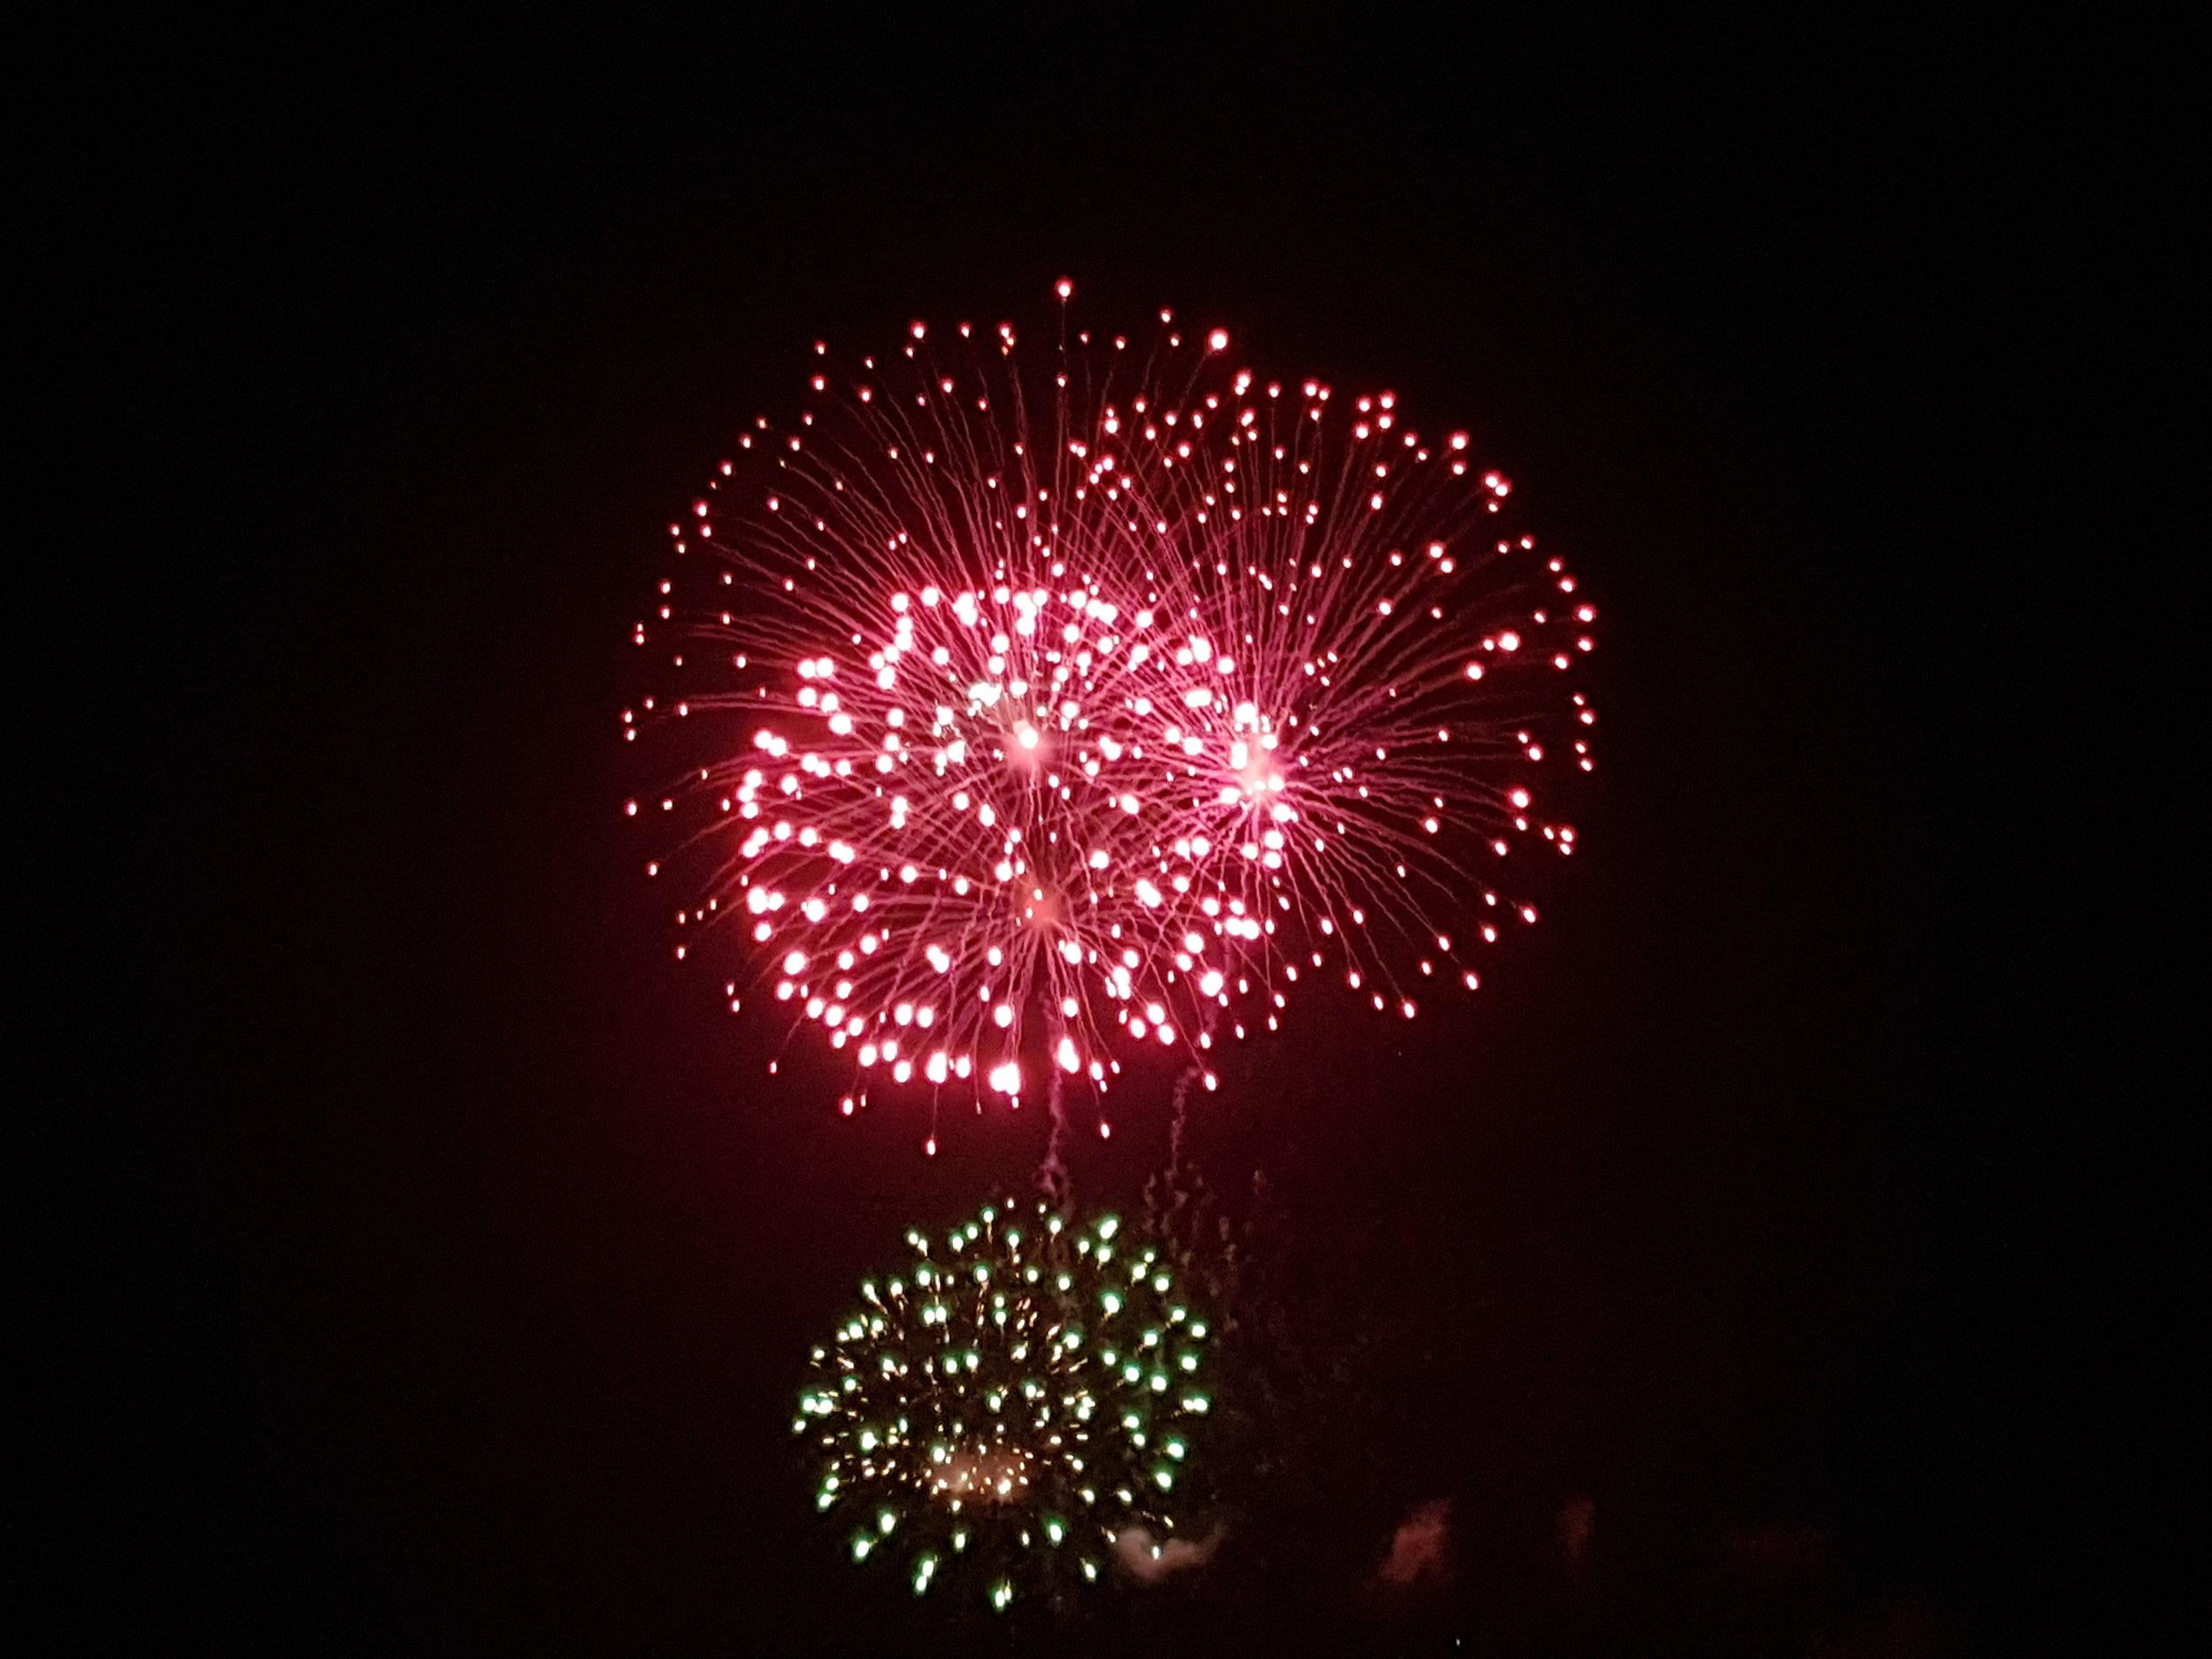 Fireworks at Cassiobury Park, Watford